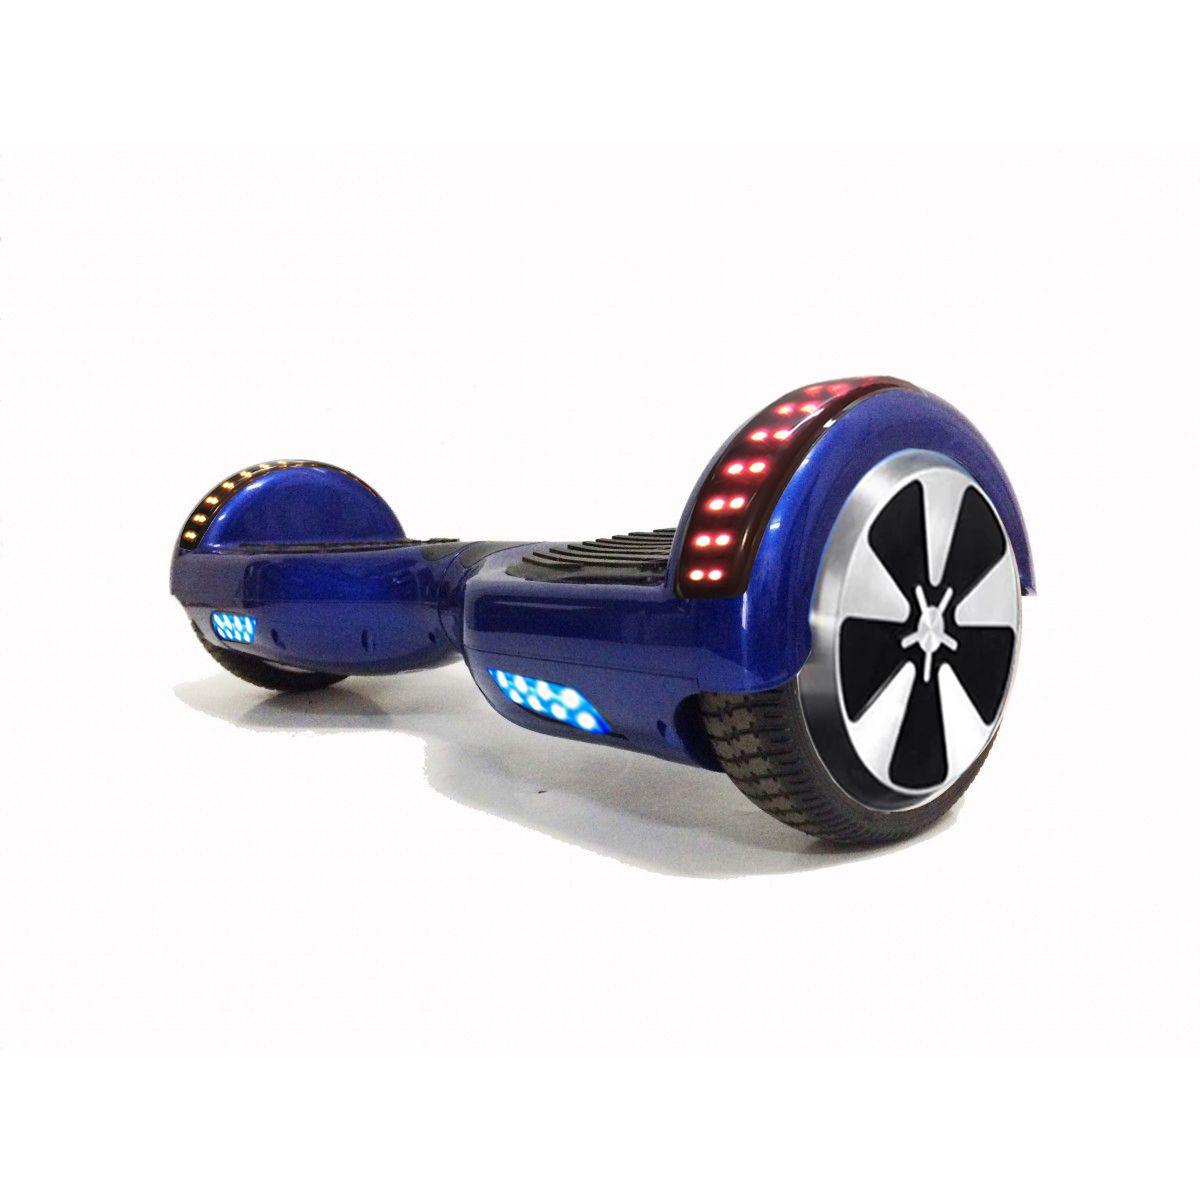 HOVERBOARD YKCHIC - Azul